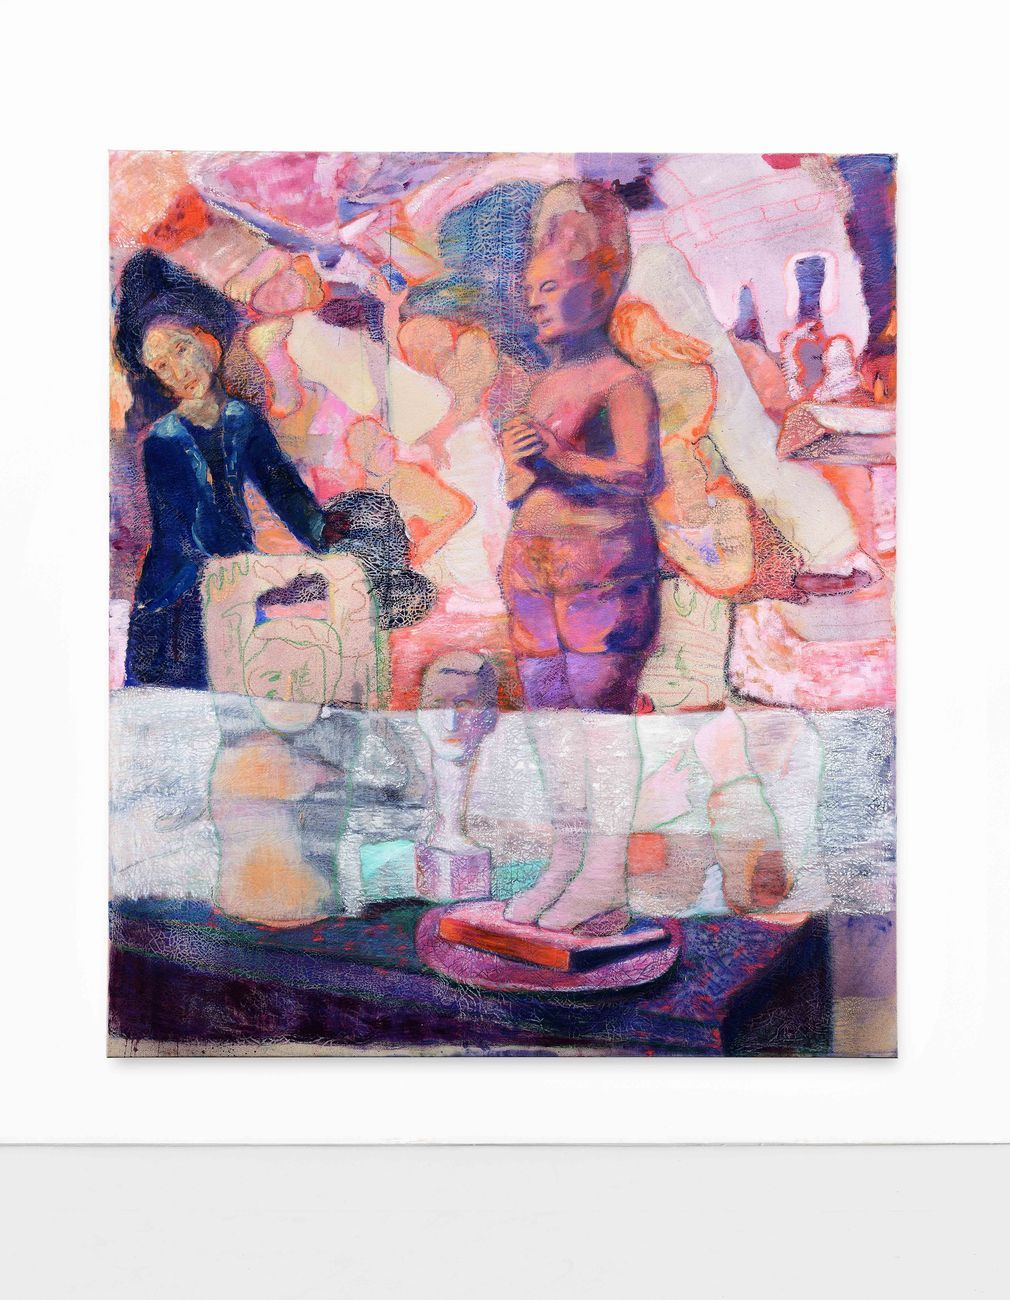 Paola Angelini, The room of the giants, 2020, tecnica mista su tela, 175 x 200 cm. Photo credits Michele Alberto Sereni